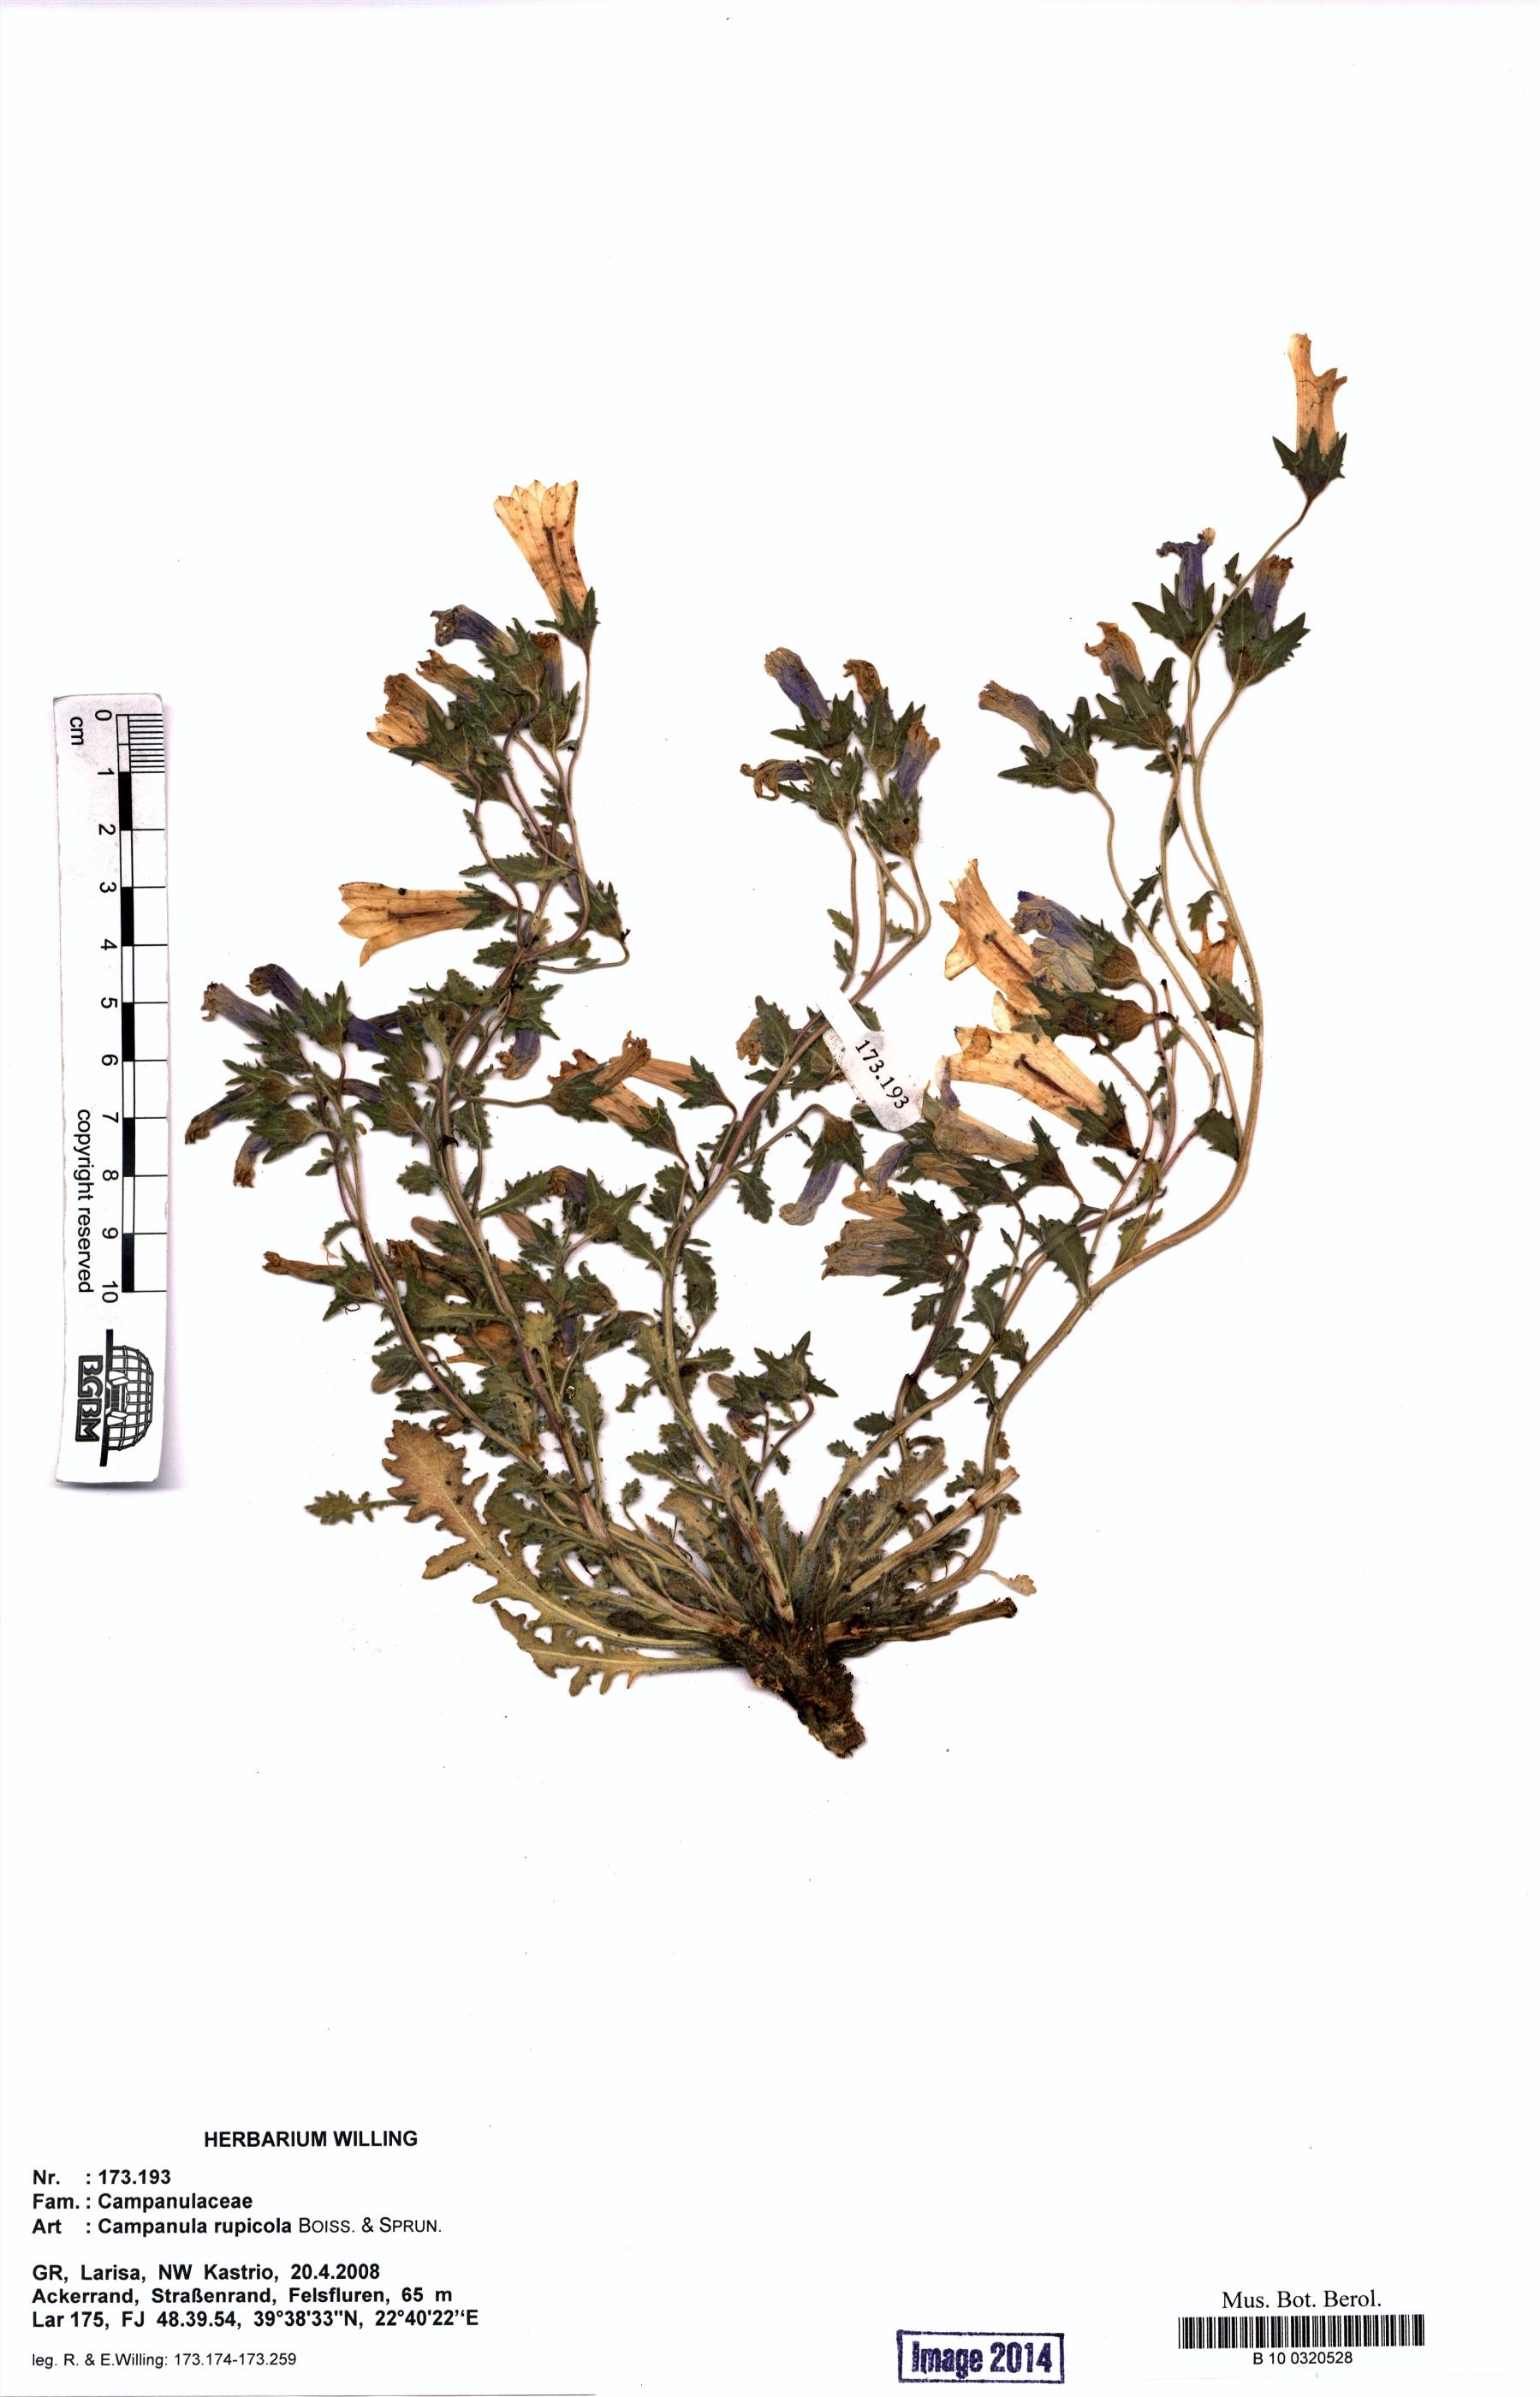 http://ww2.bgbm.org/herbarium/images/B/10/03/20/52/B_10_0320528.jpg